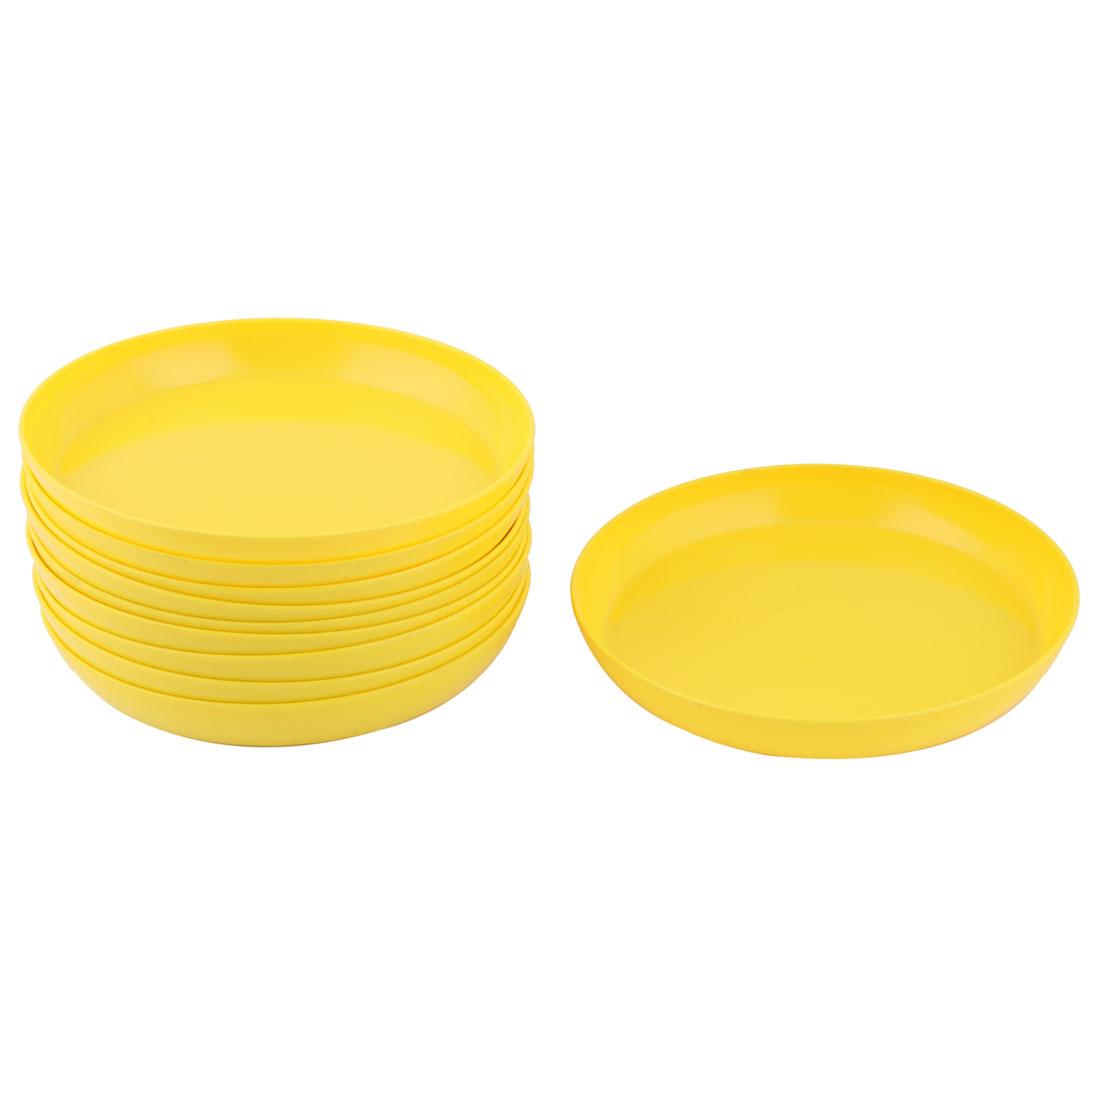 Household Yard Garden Melamine Round Flower Pot Holder Tray Yellow 8.6 Inch Dia 10 Pcs